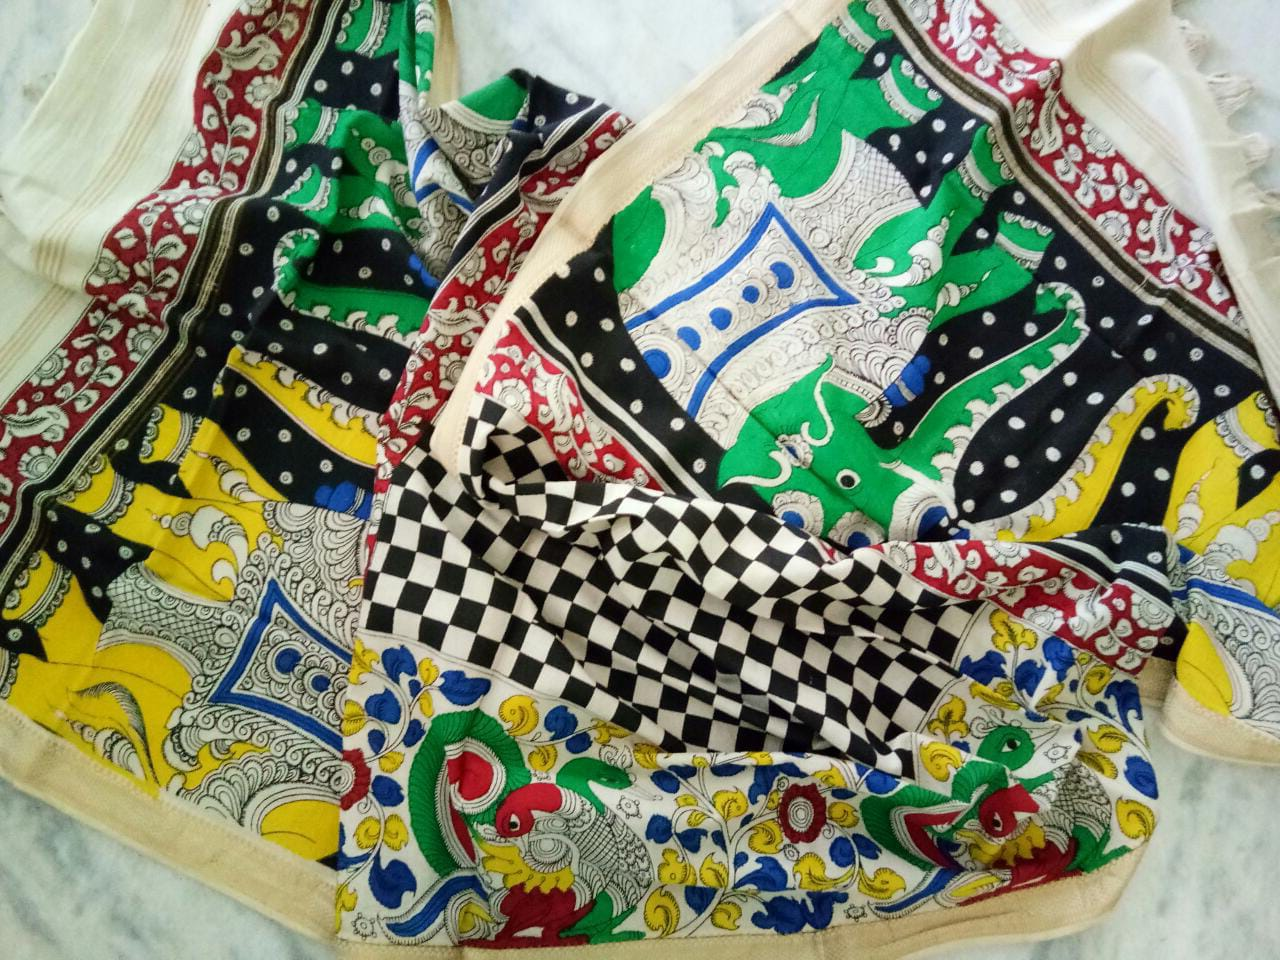 kalamkari hand painted mangalagiri Cotton dupatta-9